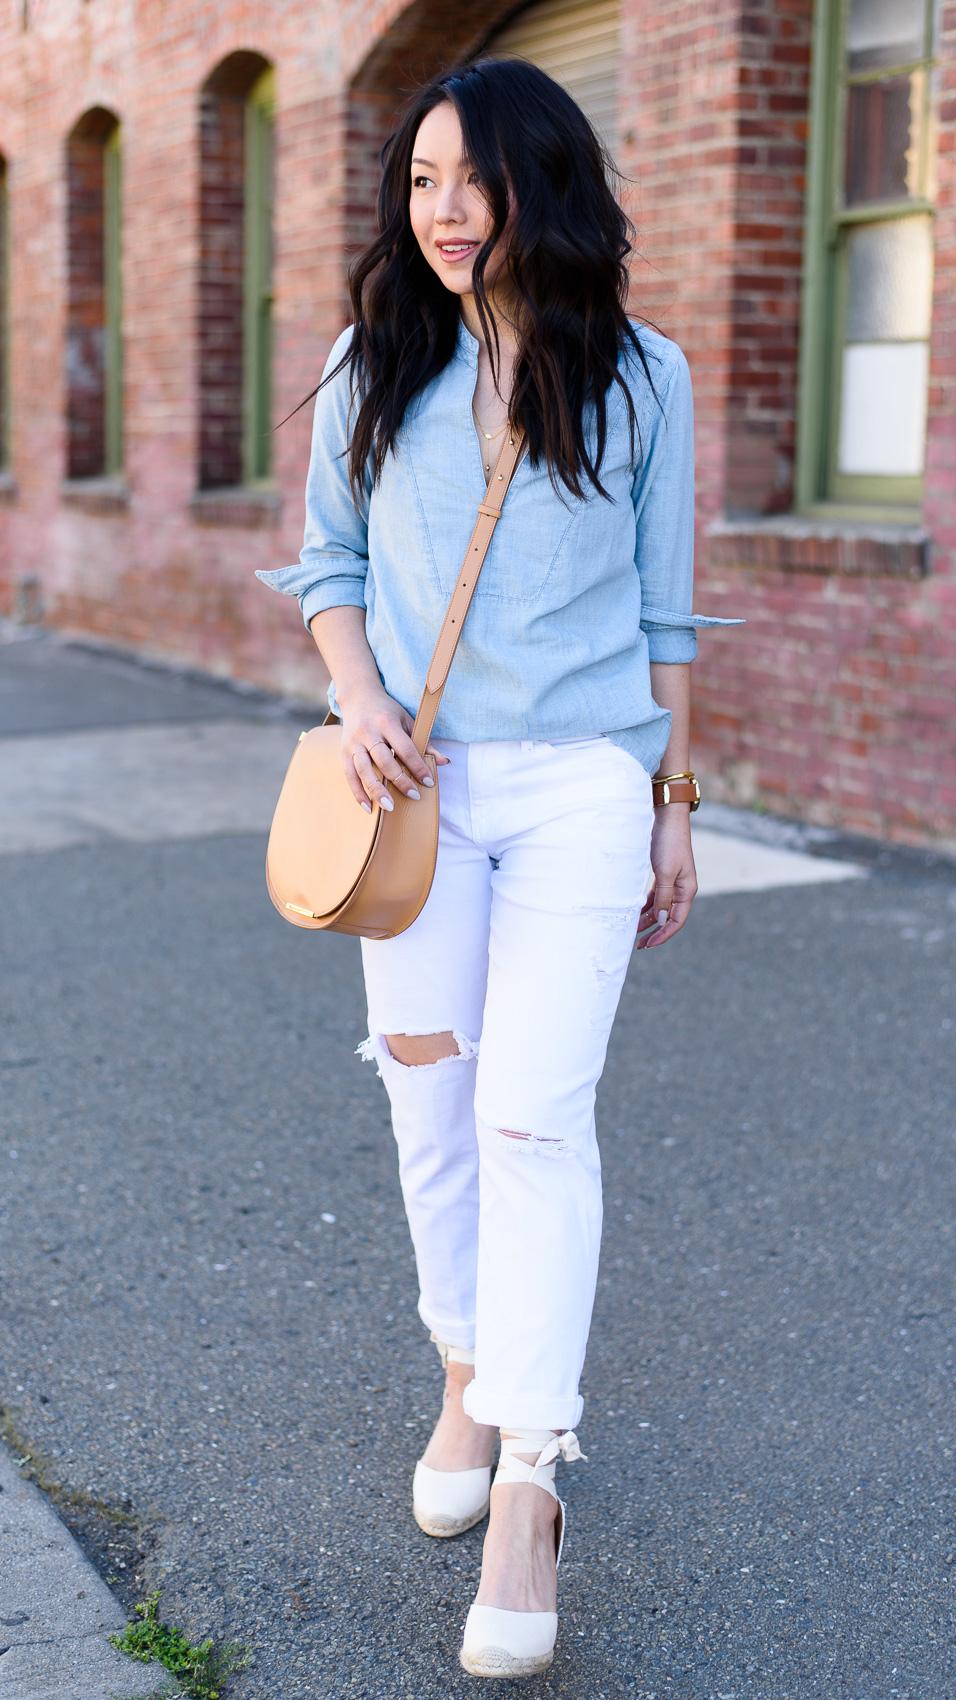 Ootd Boyfriend Jeans Again The Fancy Pants Report San Francisco Fashion Blog